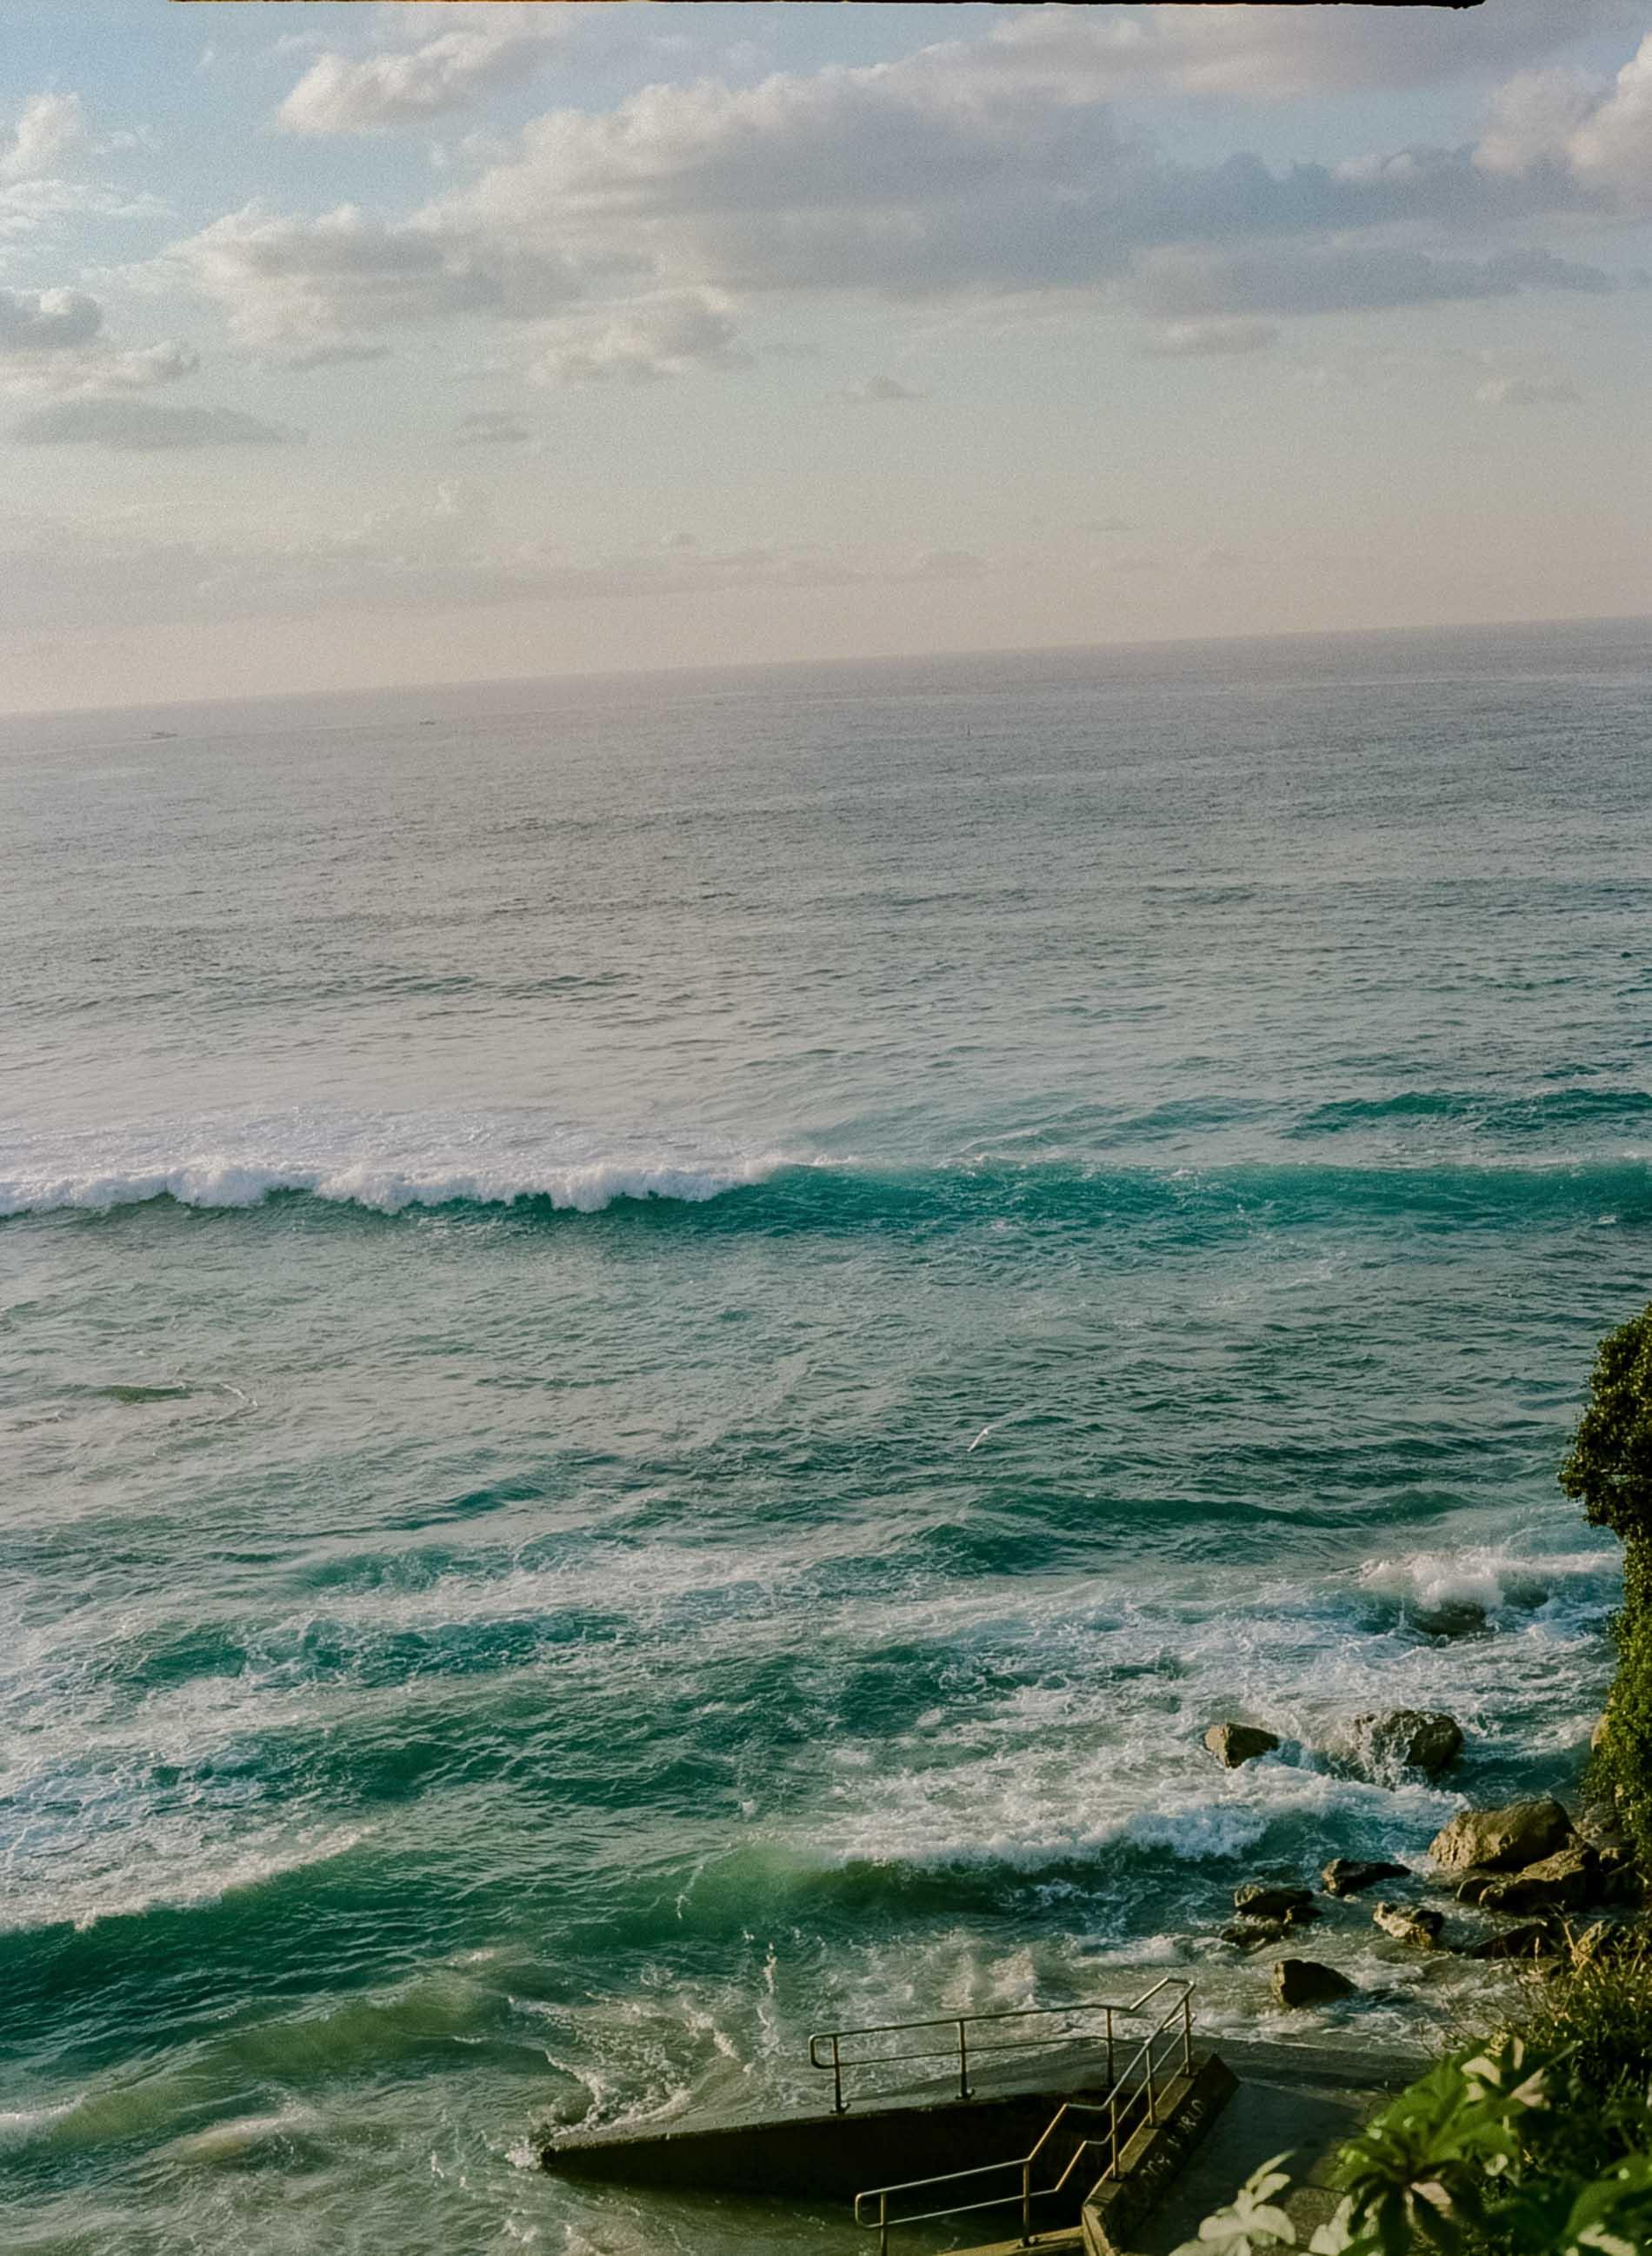 Bondi Beach, Australia, Justin Chung, Sydney, Icebergs Beach Club, Kodak